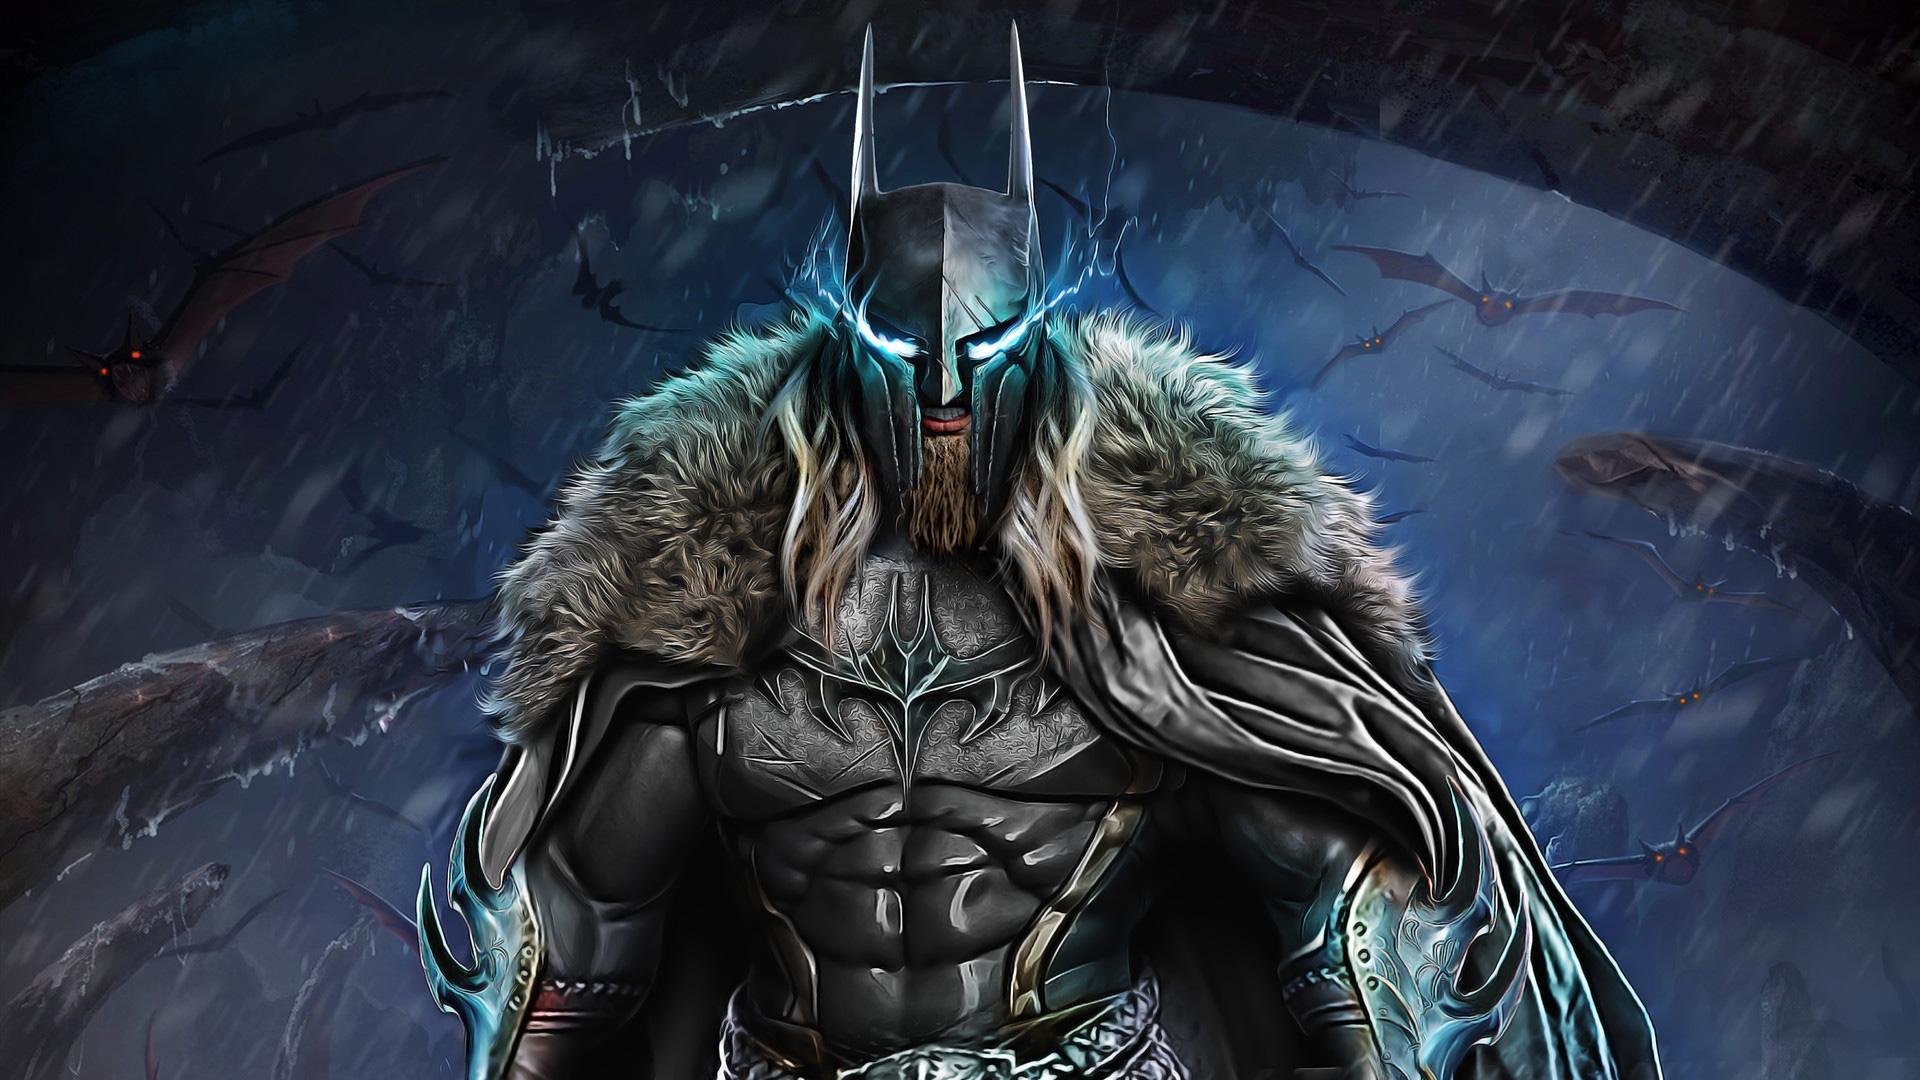 Dark Knight Warrior Art, HD Superheroes, 4k Wallpapers